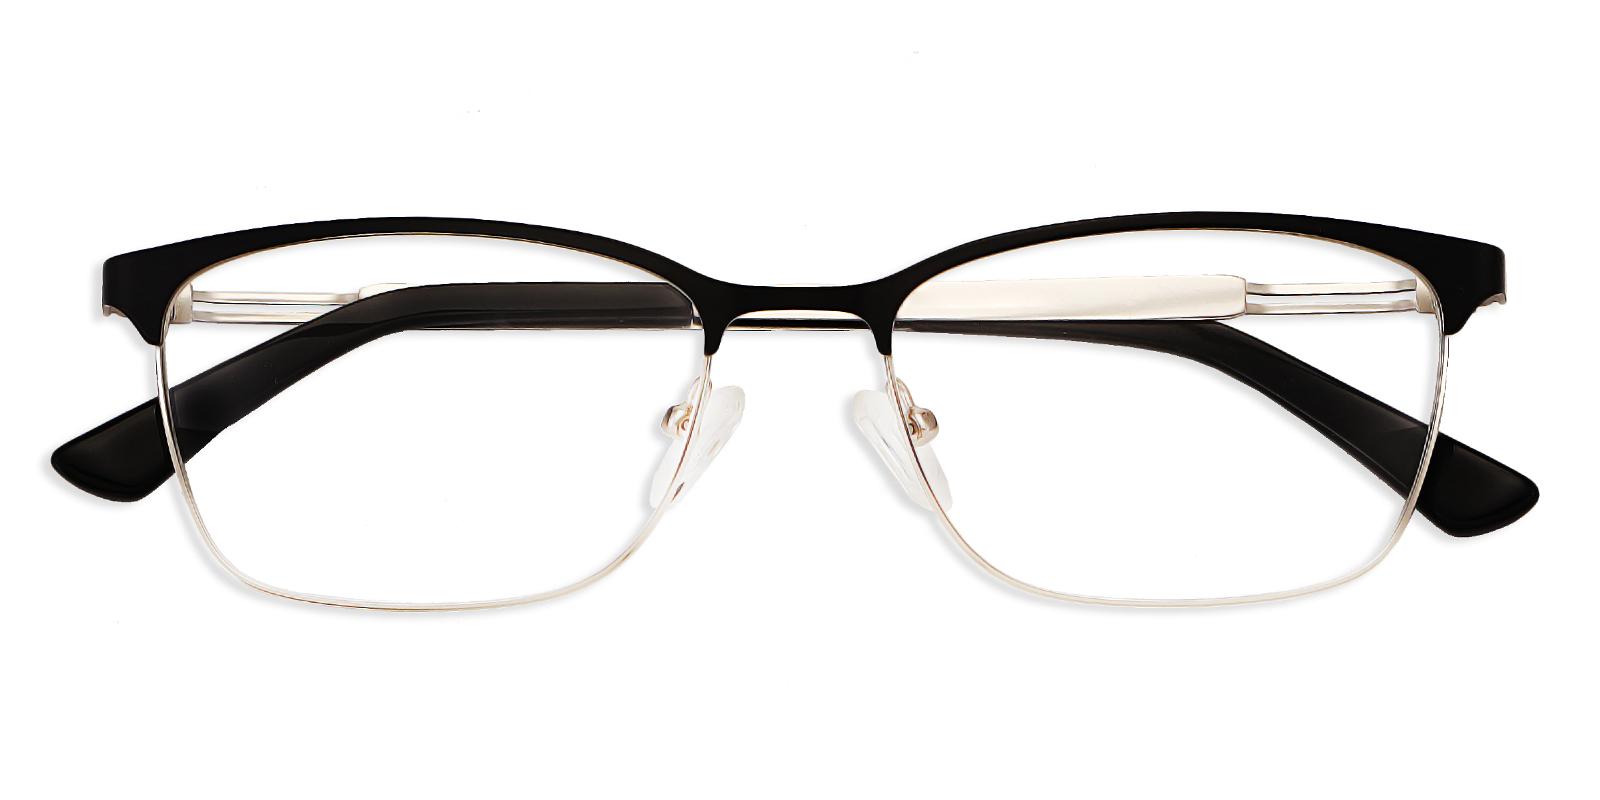 Eden-Full rim rectangle glasses with hollow hinge design